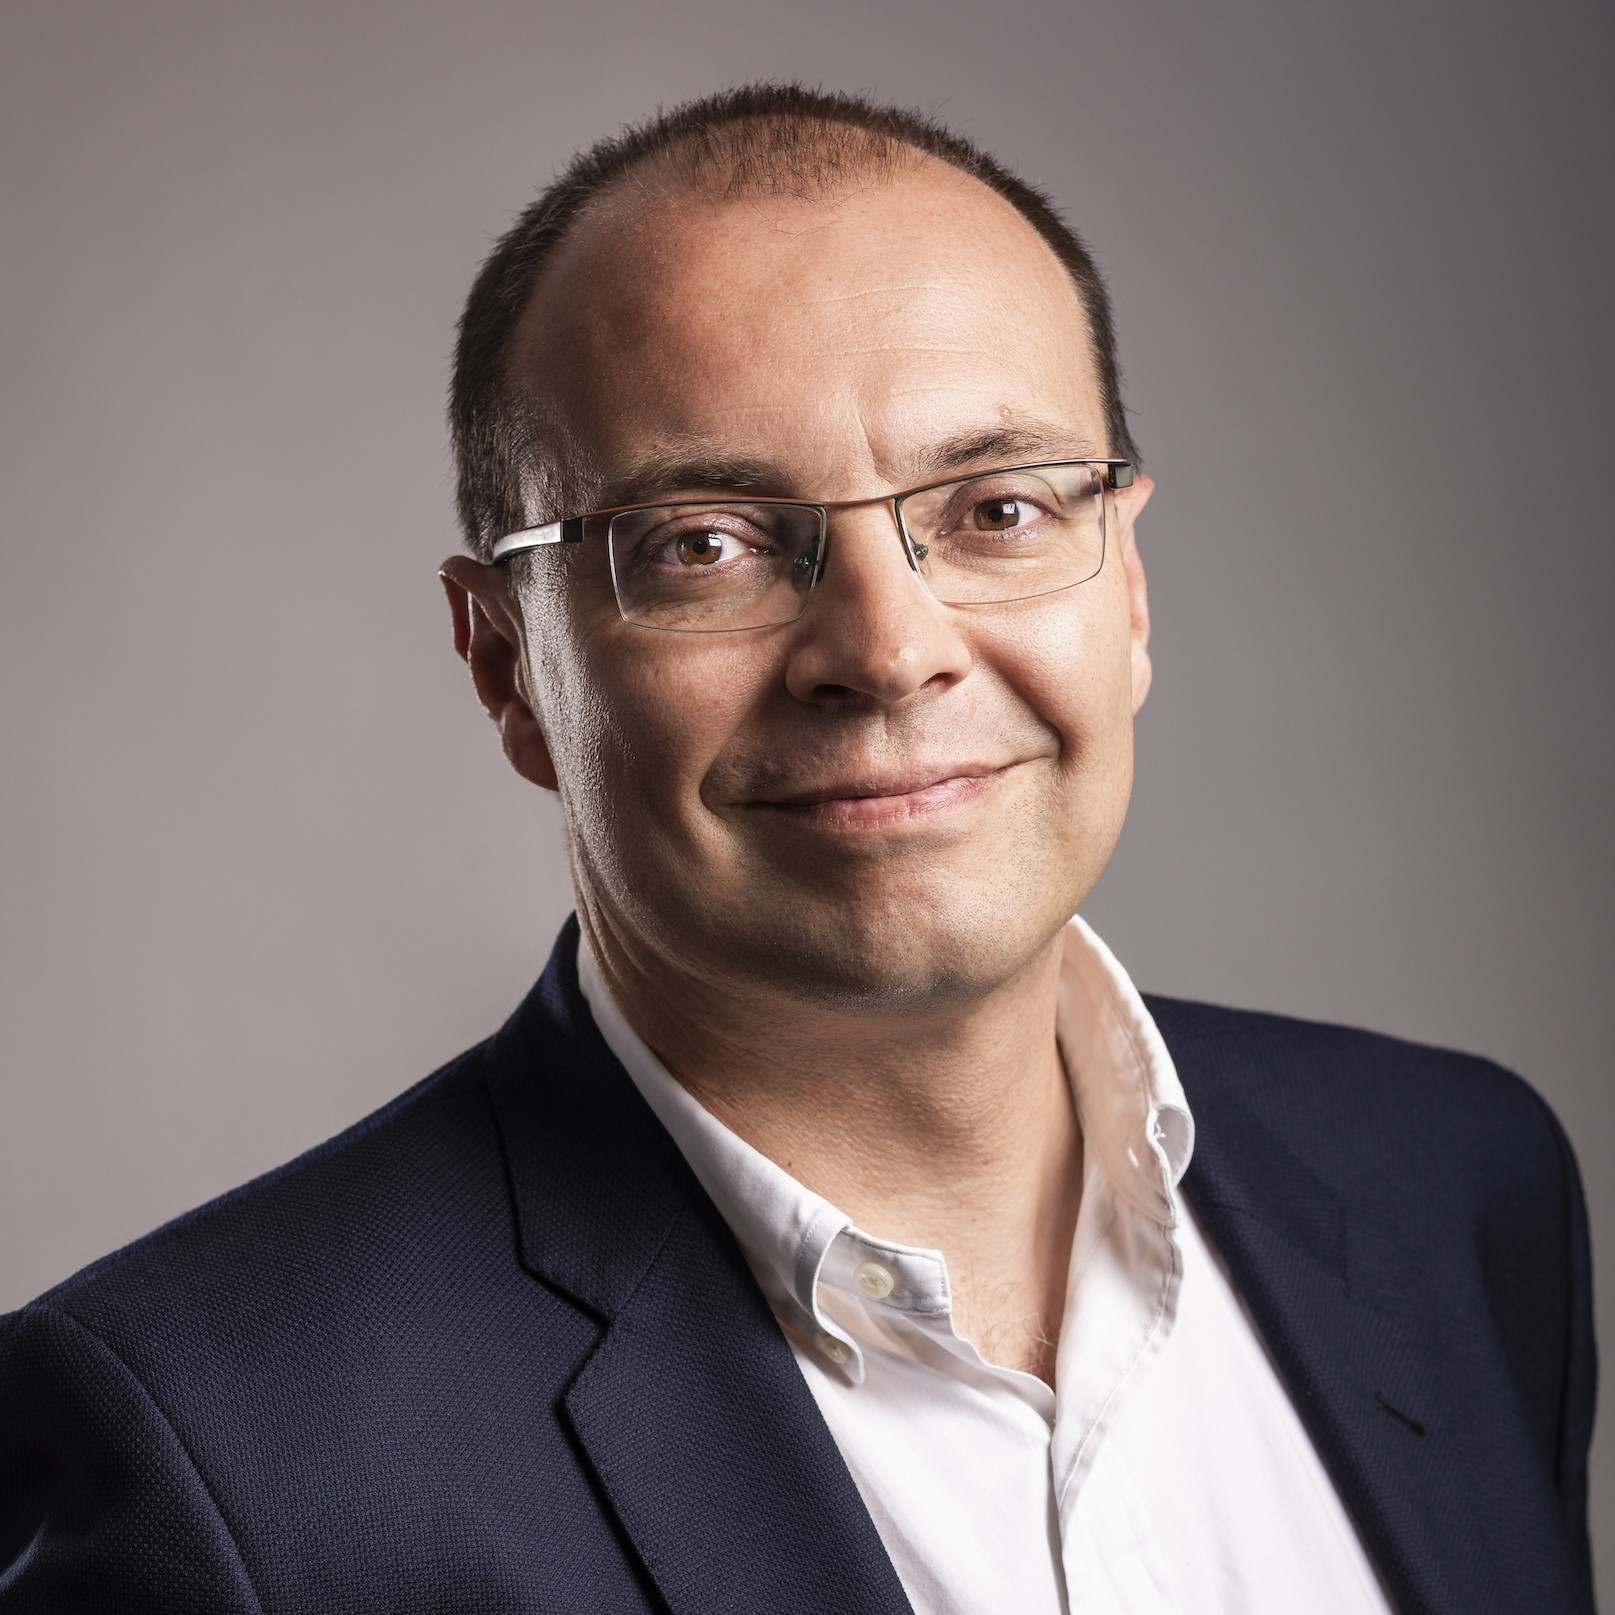 Olivier Savornin